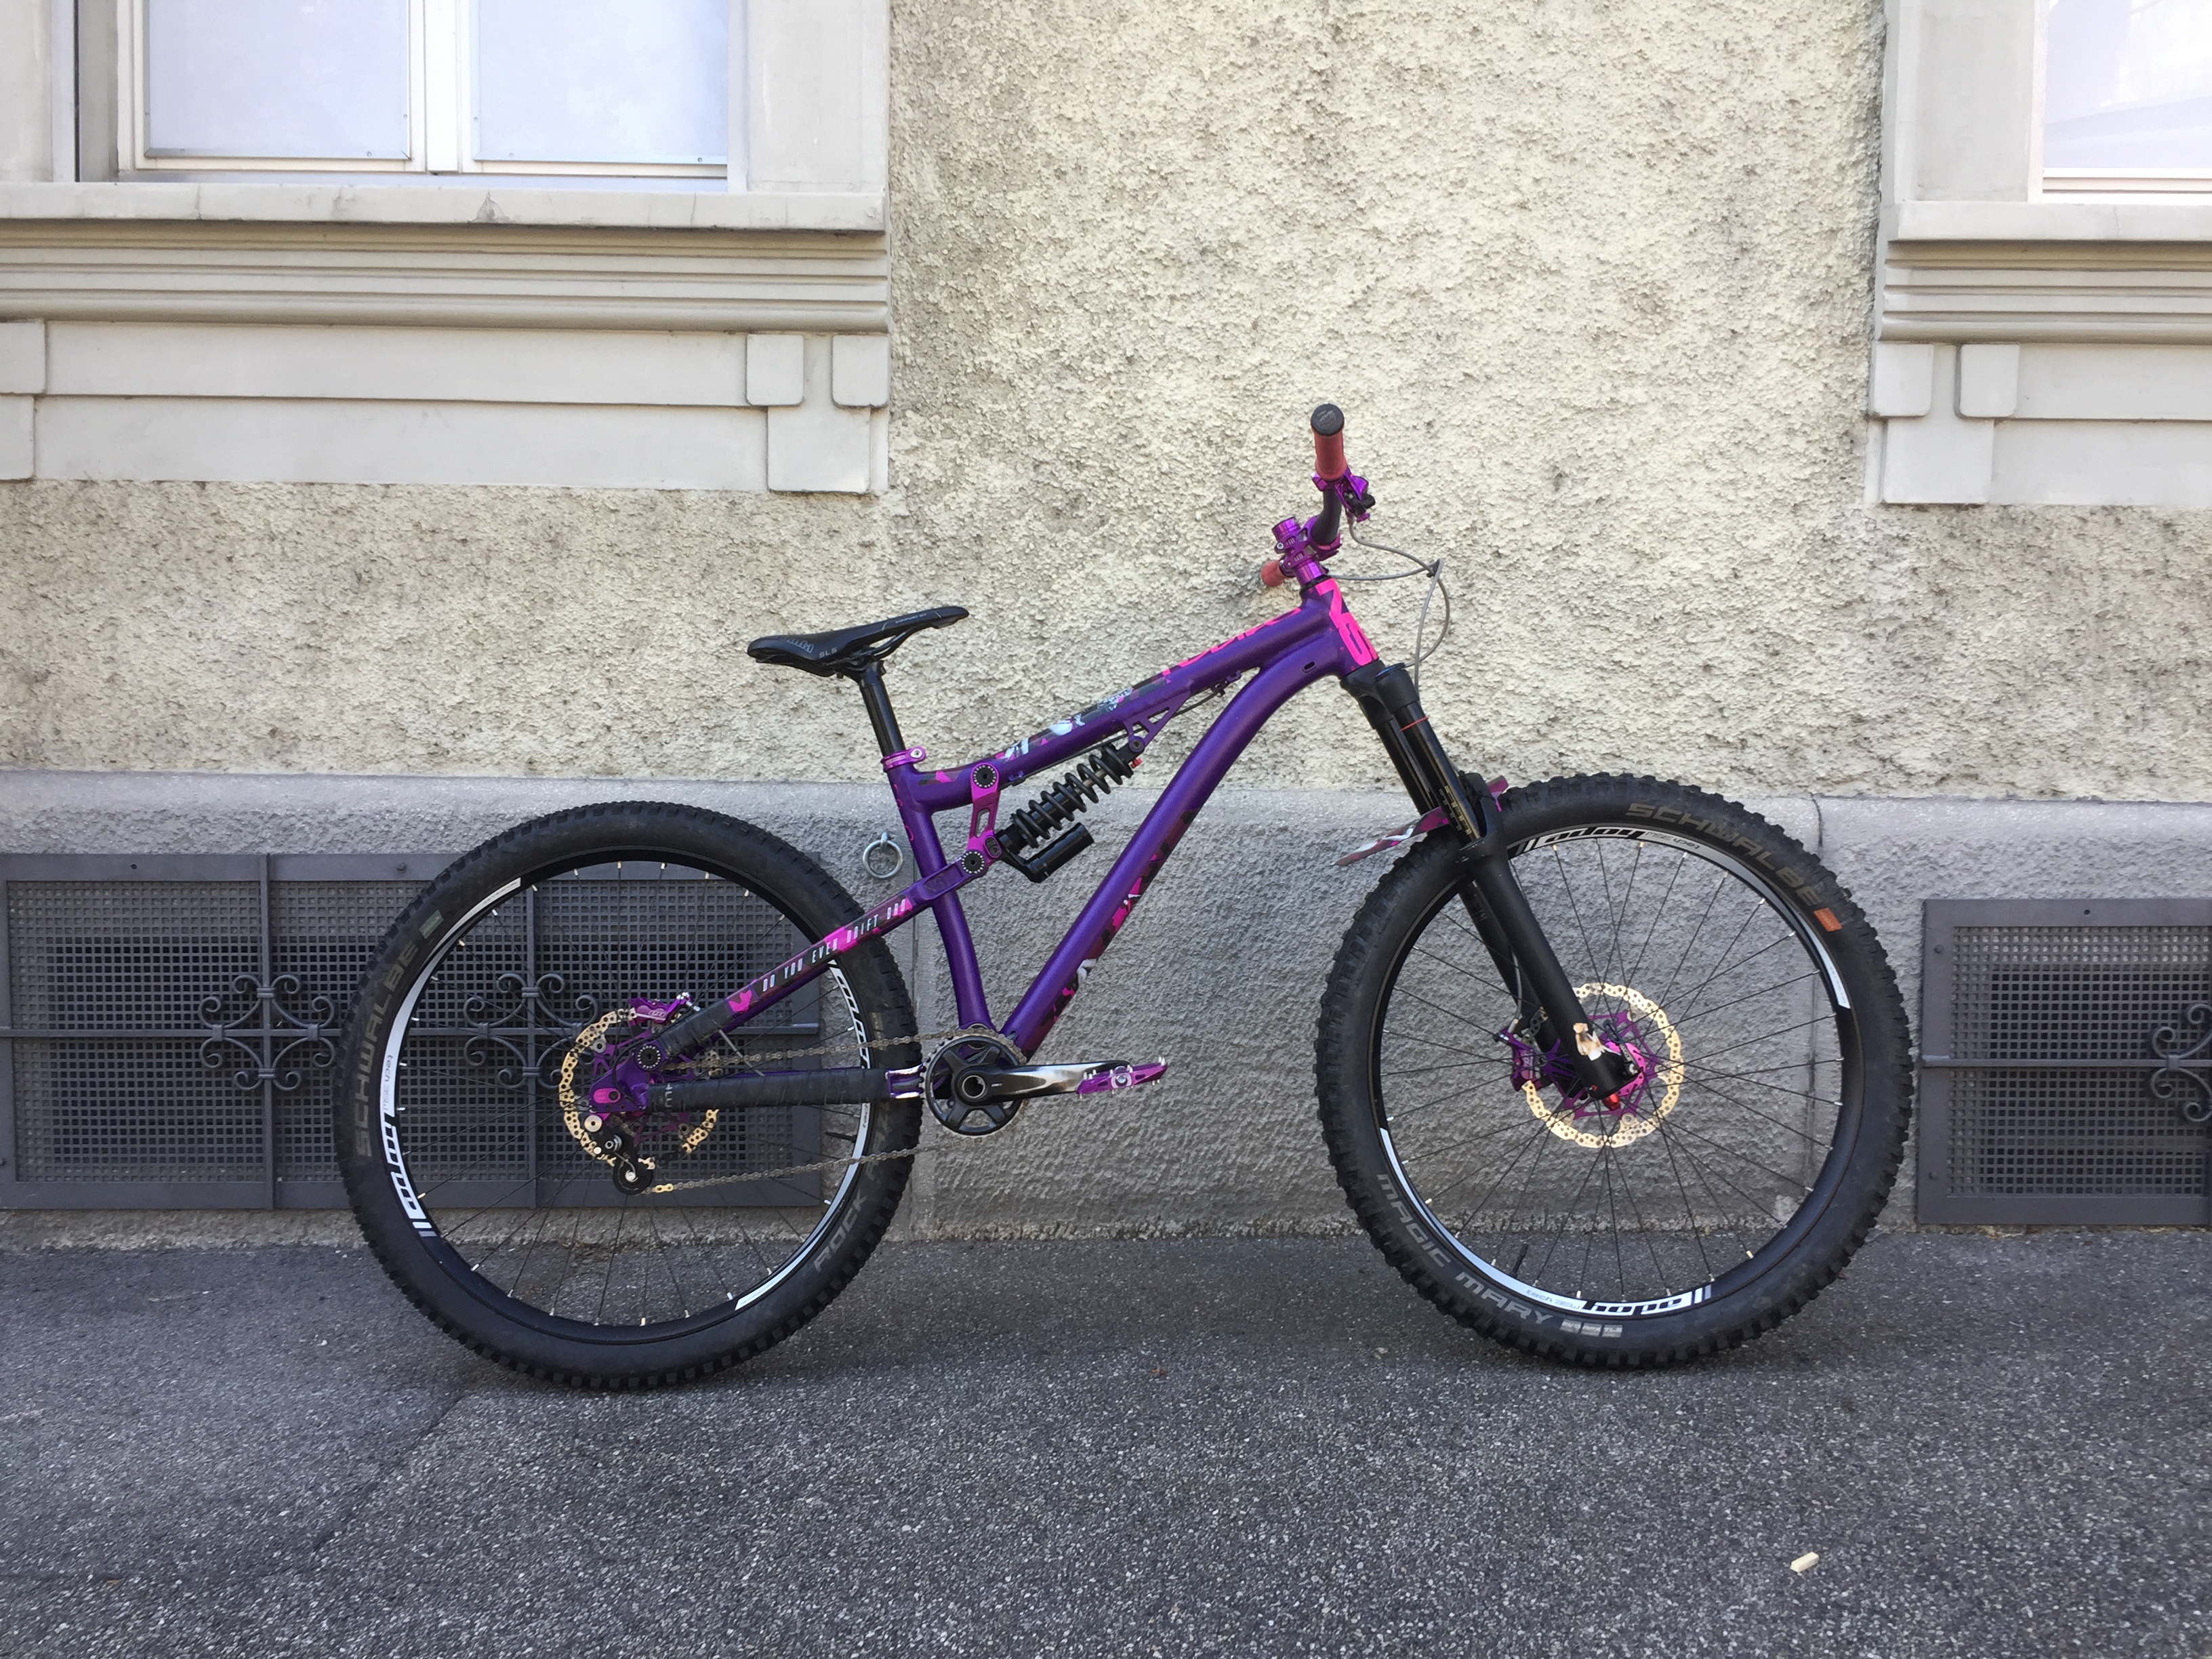 dea7e77462e NS Soda Evo - Bizzelzzzzz's Bike Check - Vital MTB